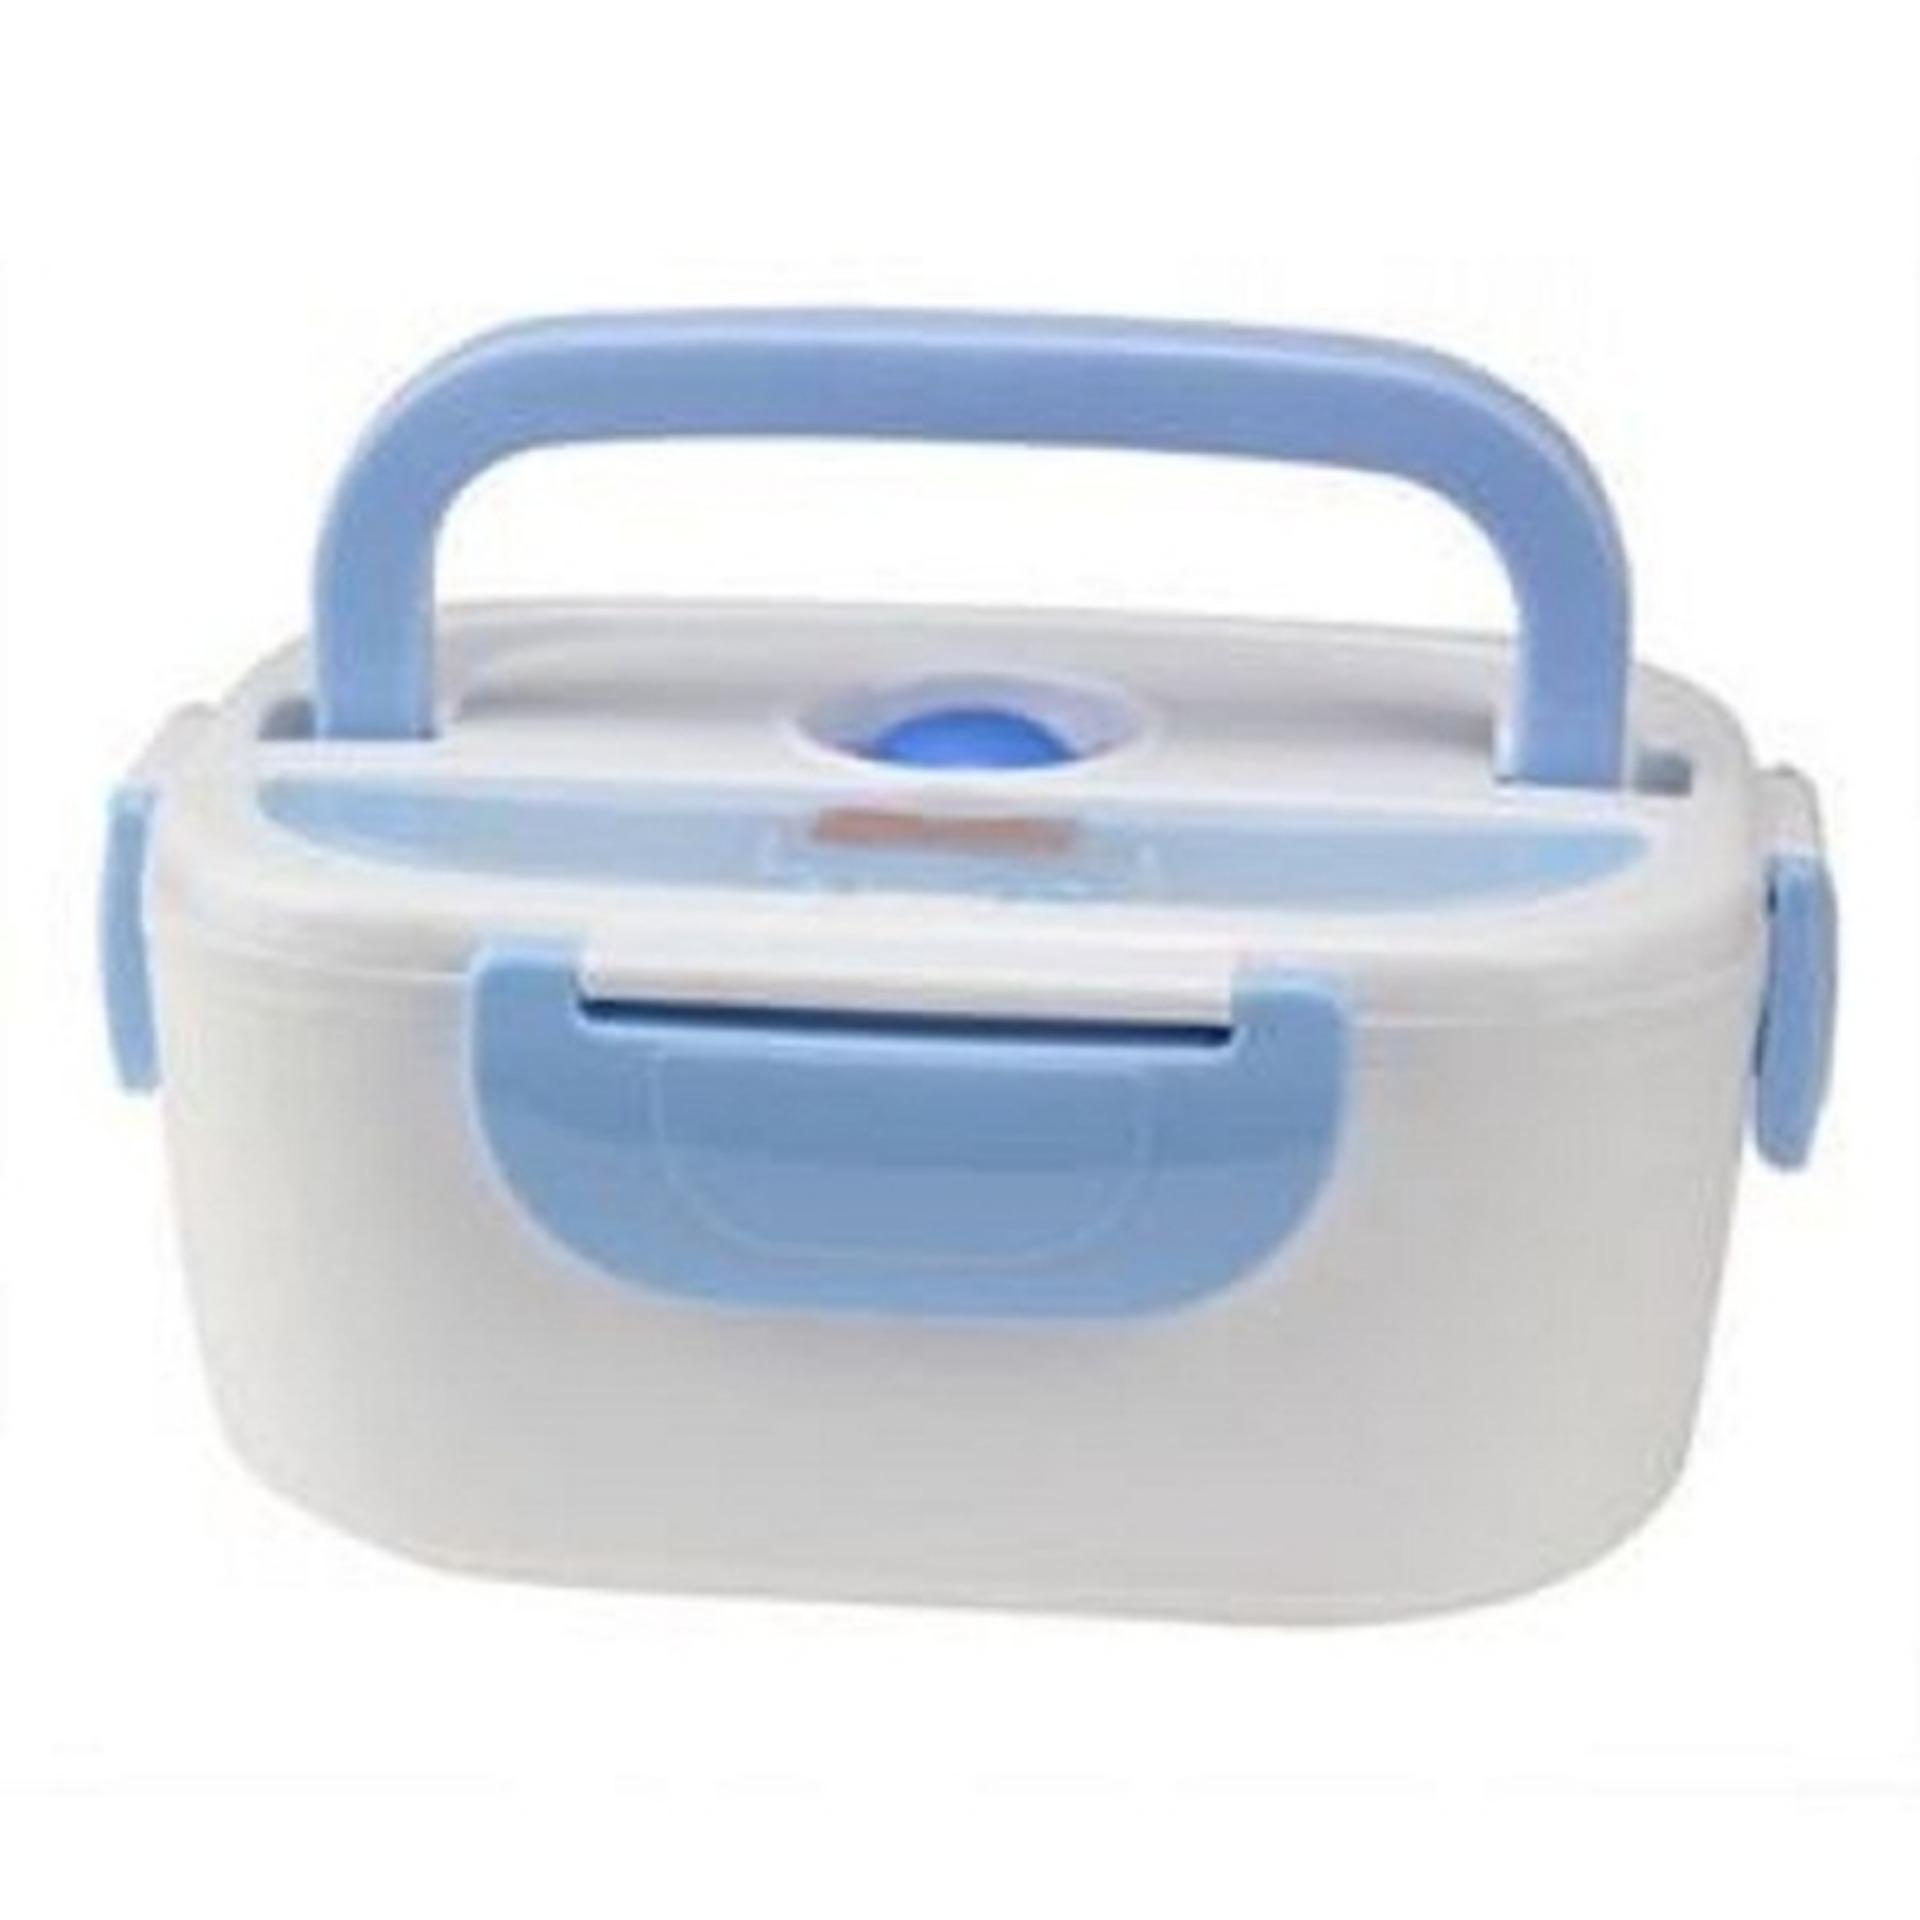 Jual Emyli Lunch Box Kotak Makan Elektrik Import